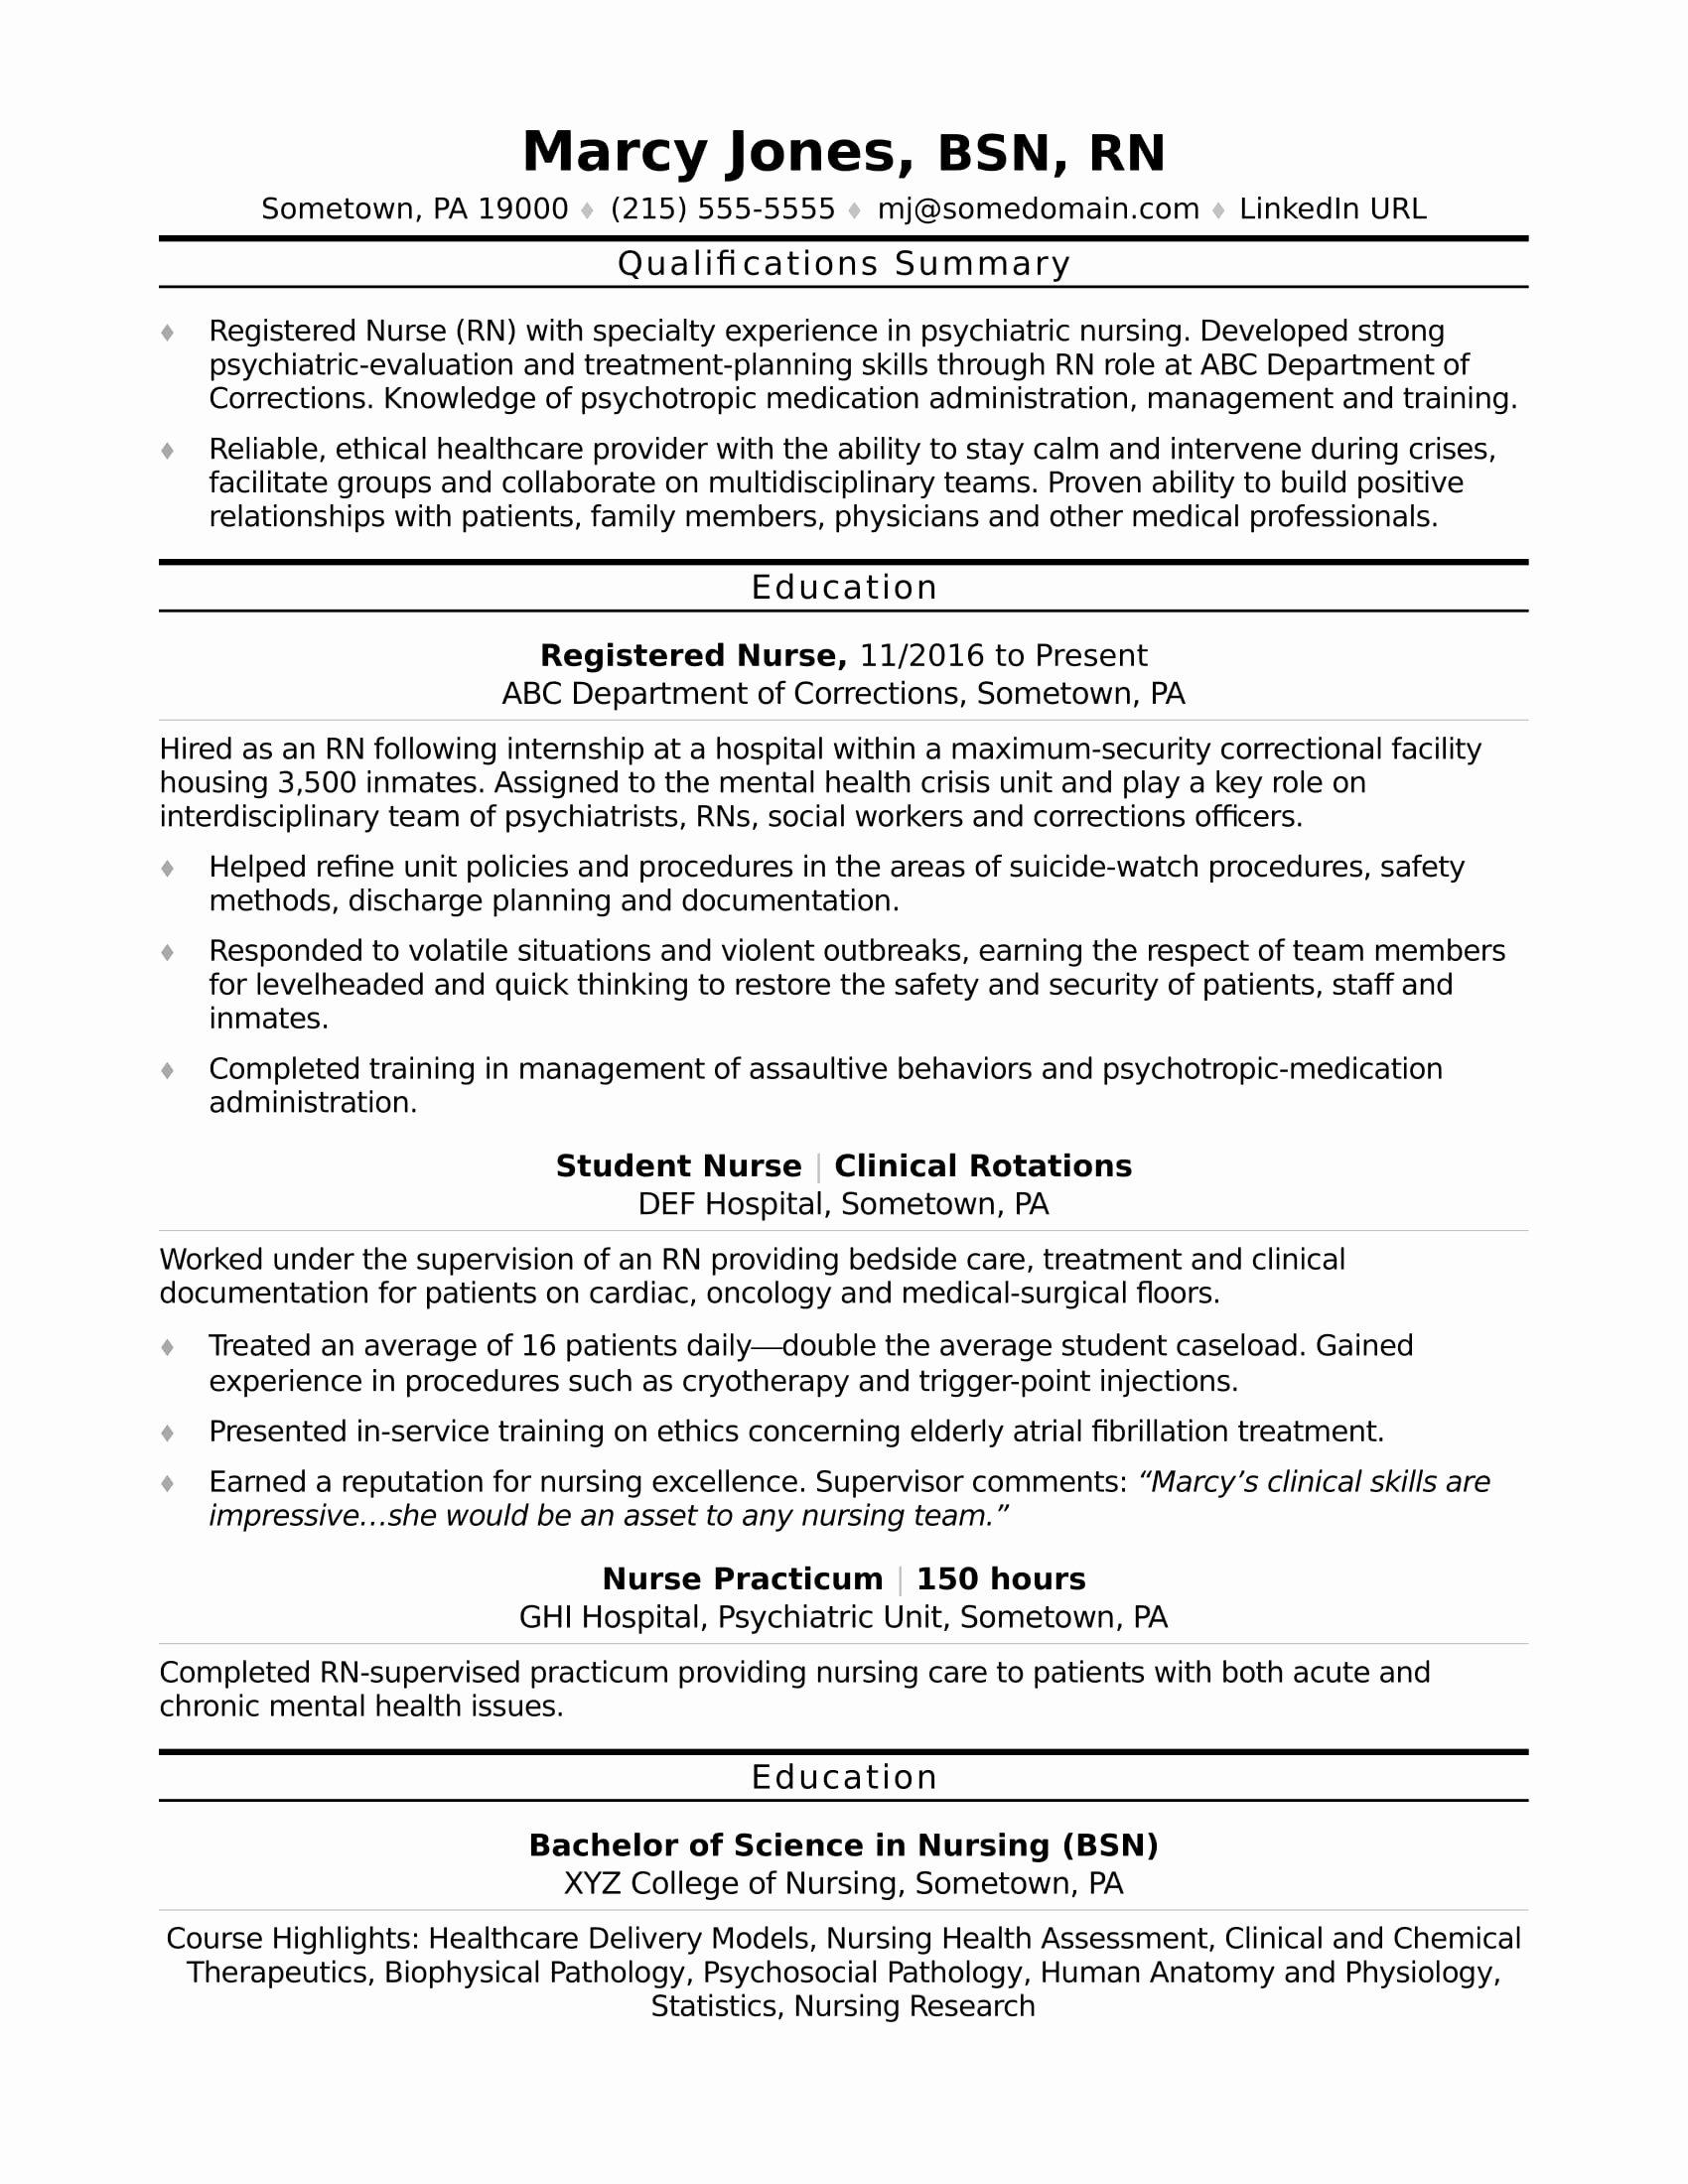 Rn Resume Template Free Luxury Registered Nurse Rn Resume Sample